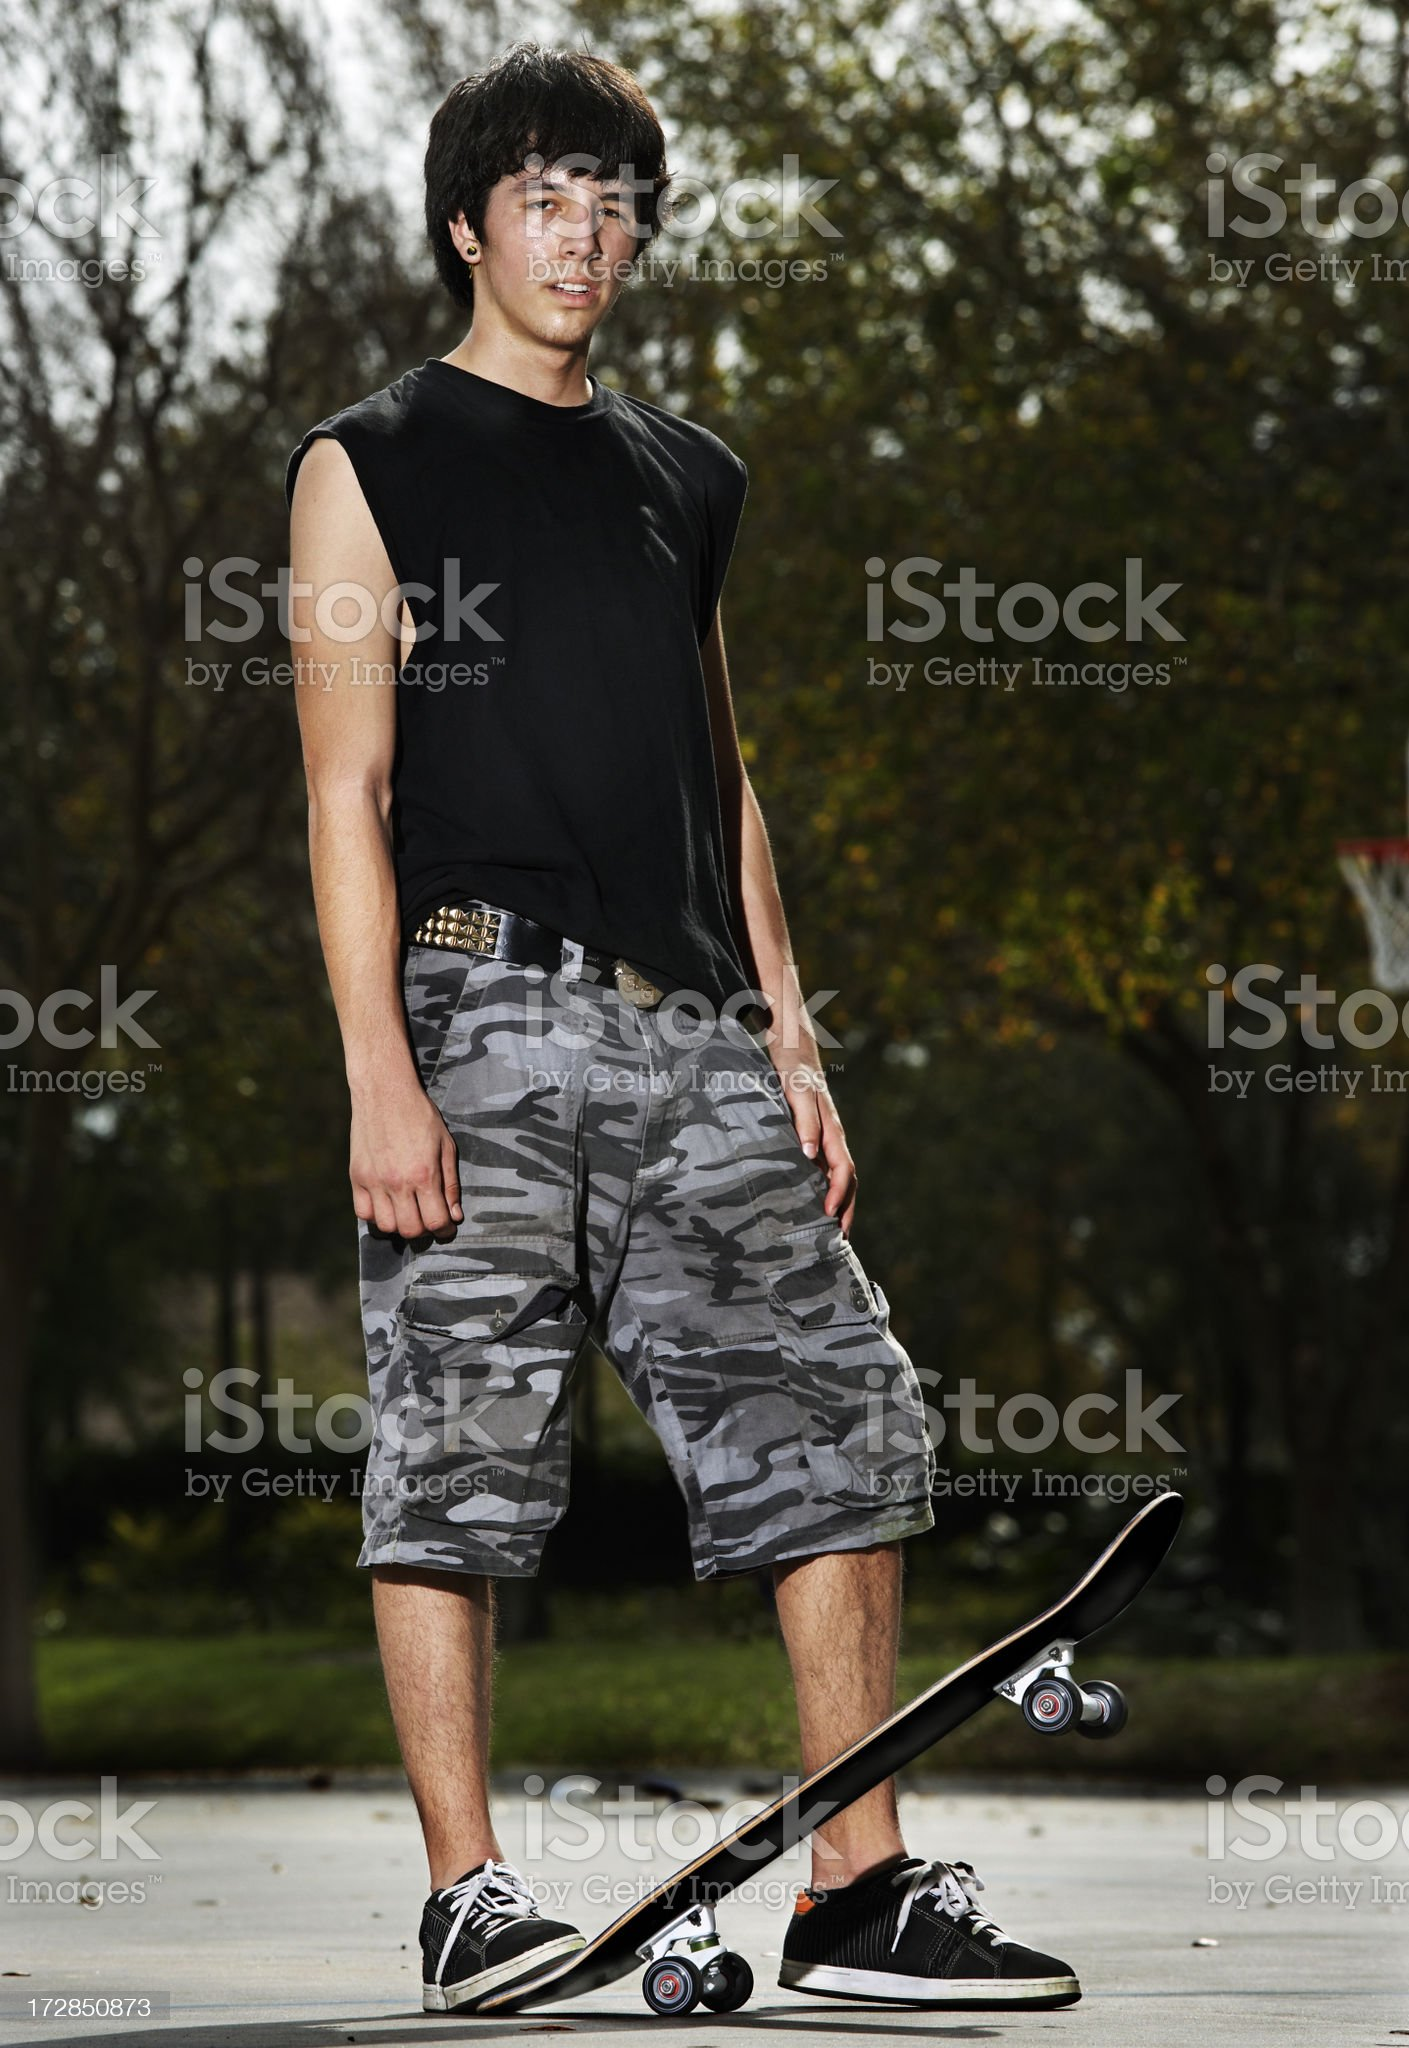 Skateboarding portrait. royalty-free stock photo